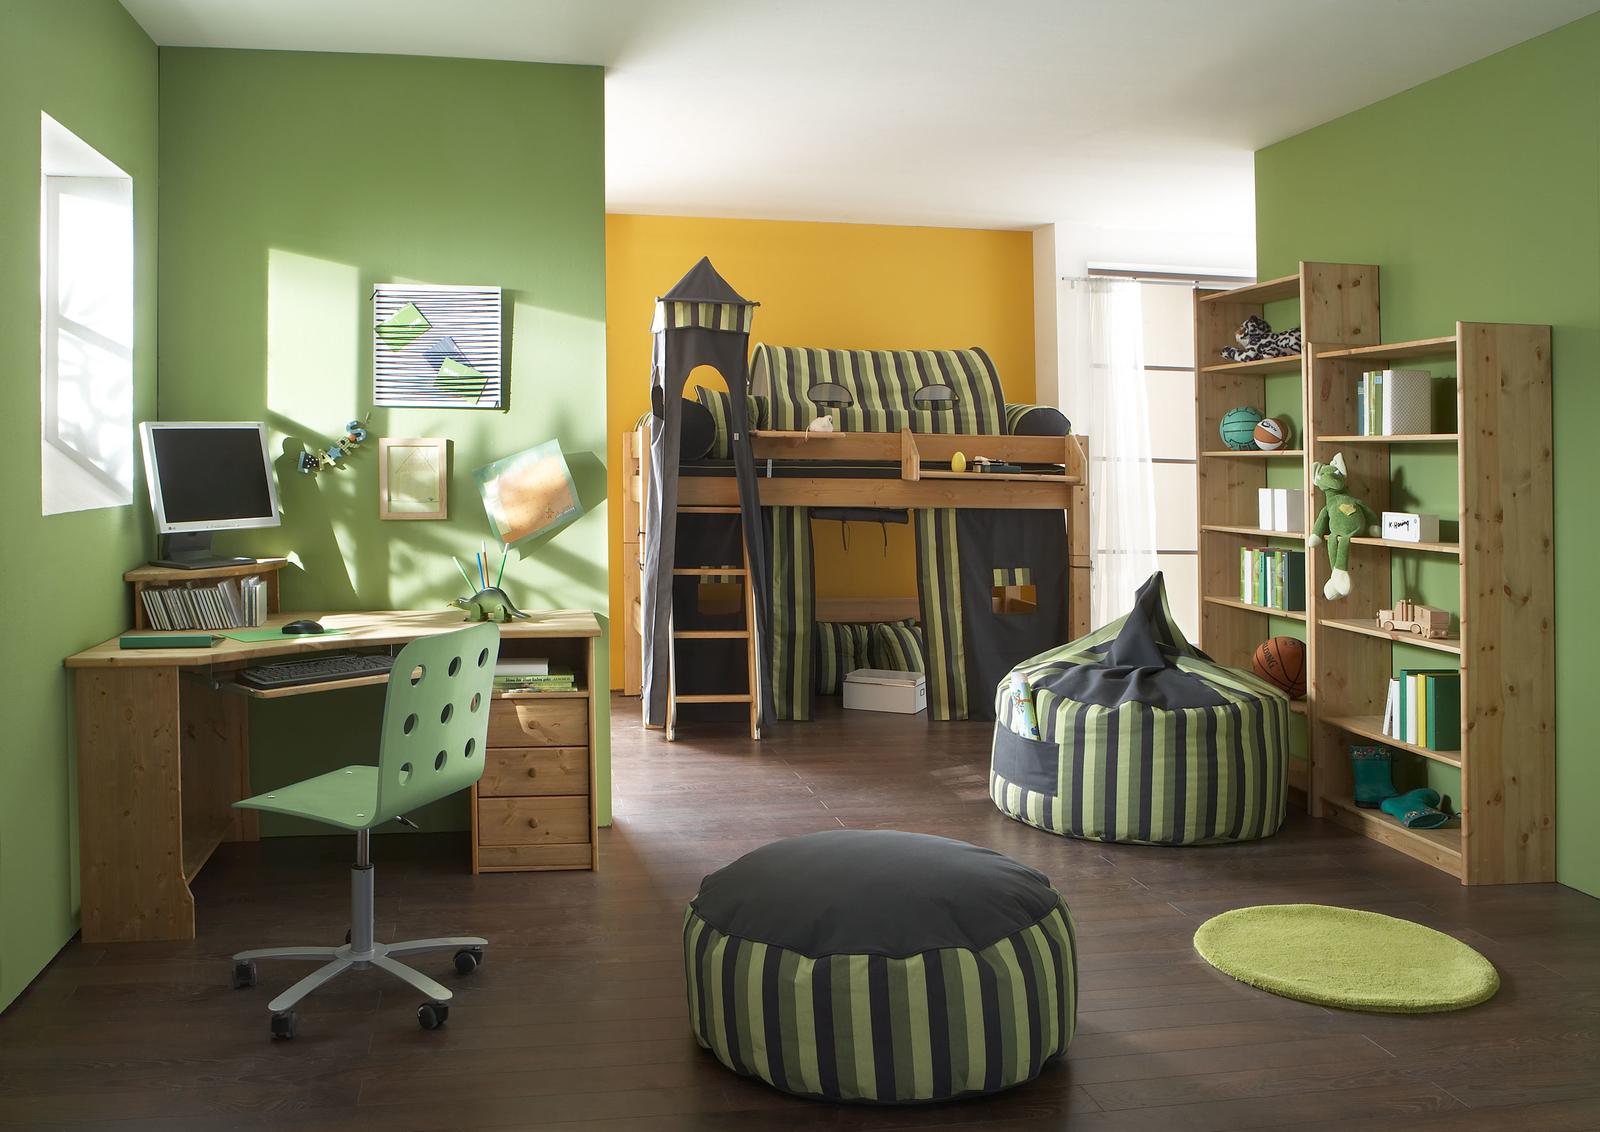 Kinderzimmer Hochbett Forest aus Massivholz